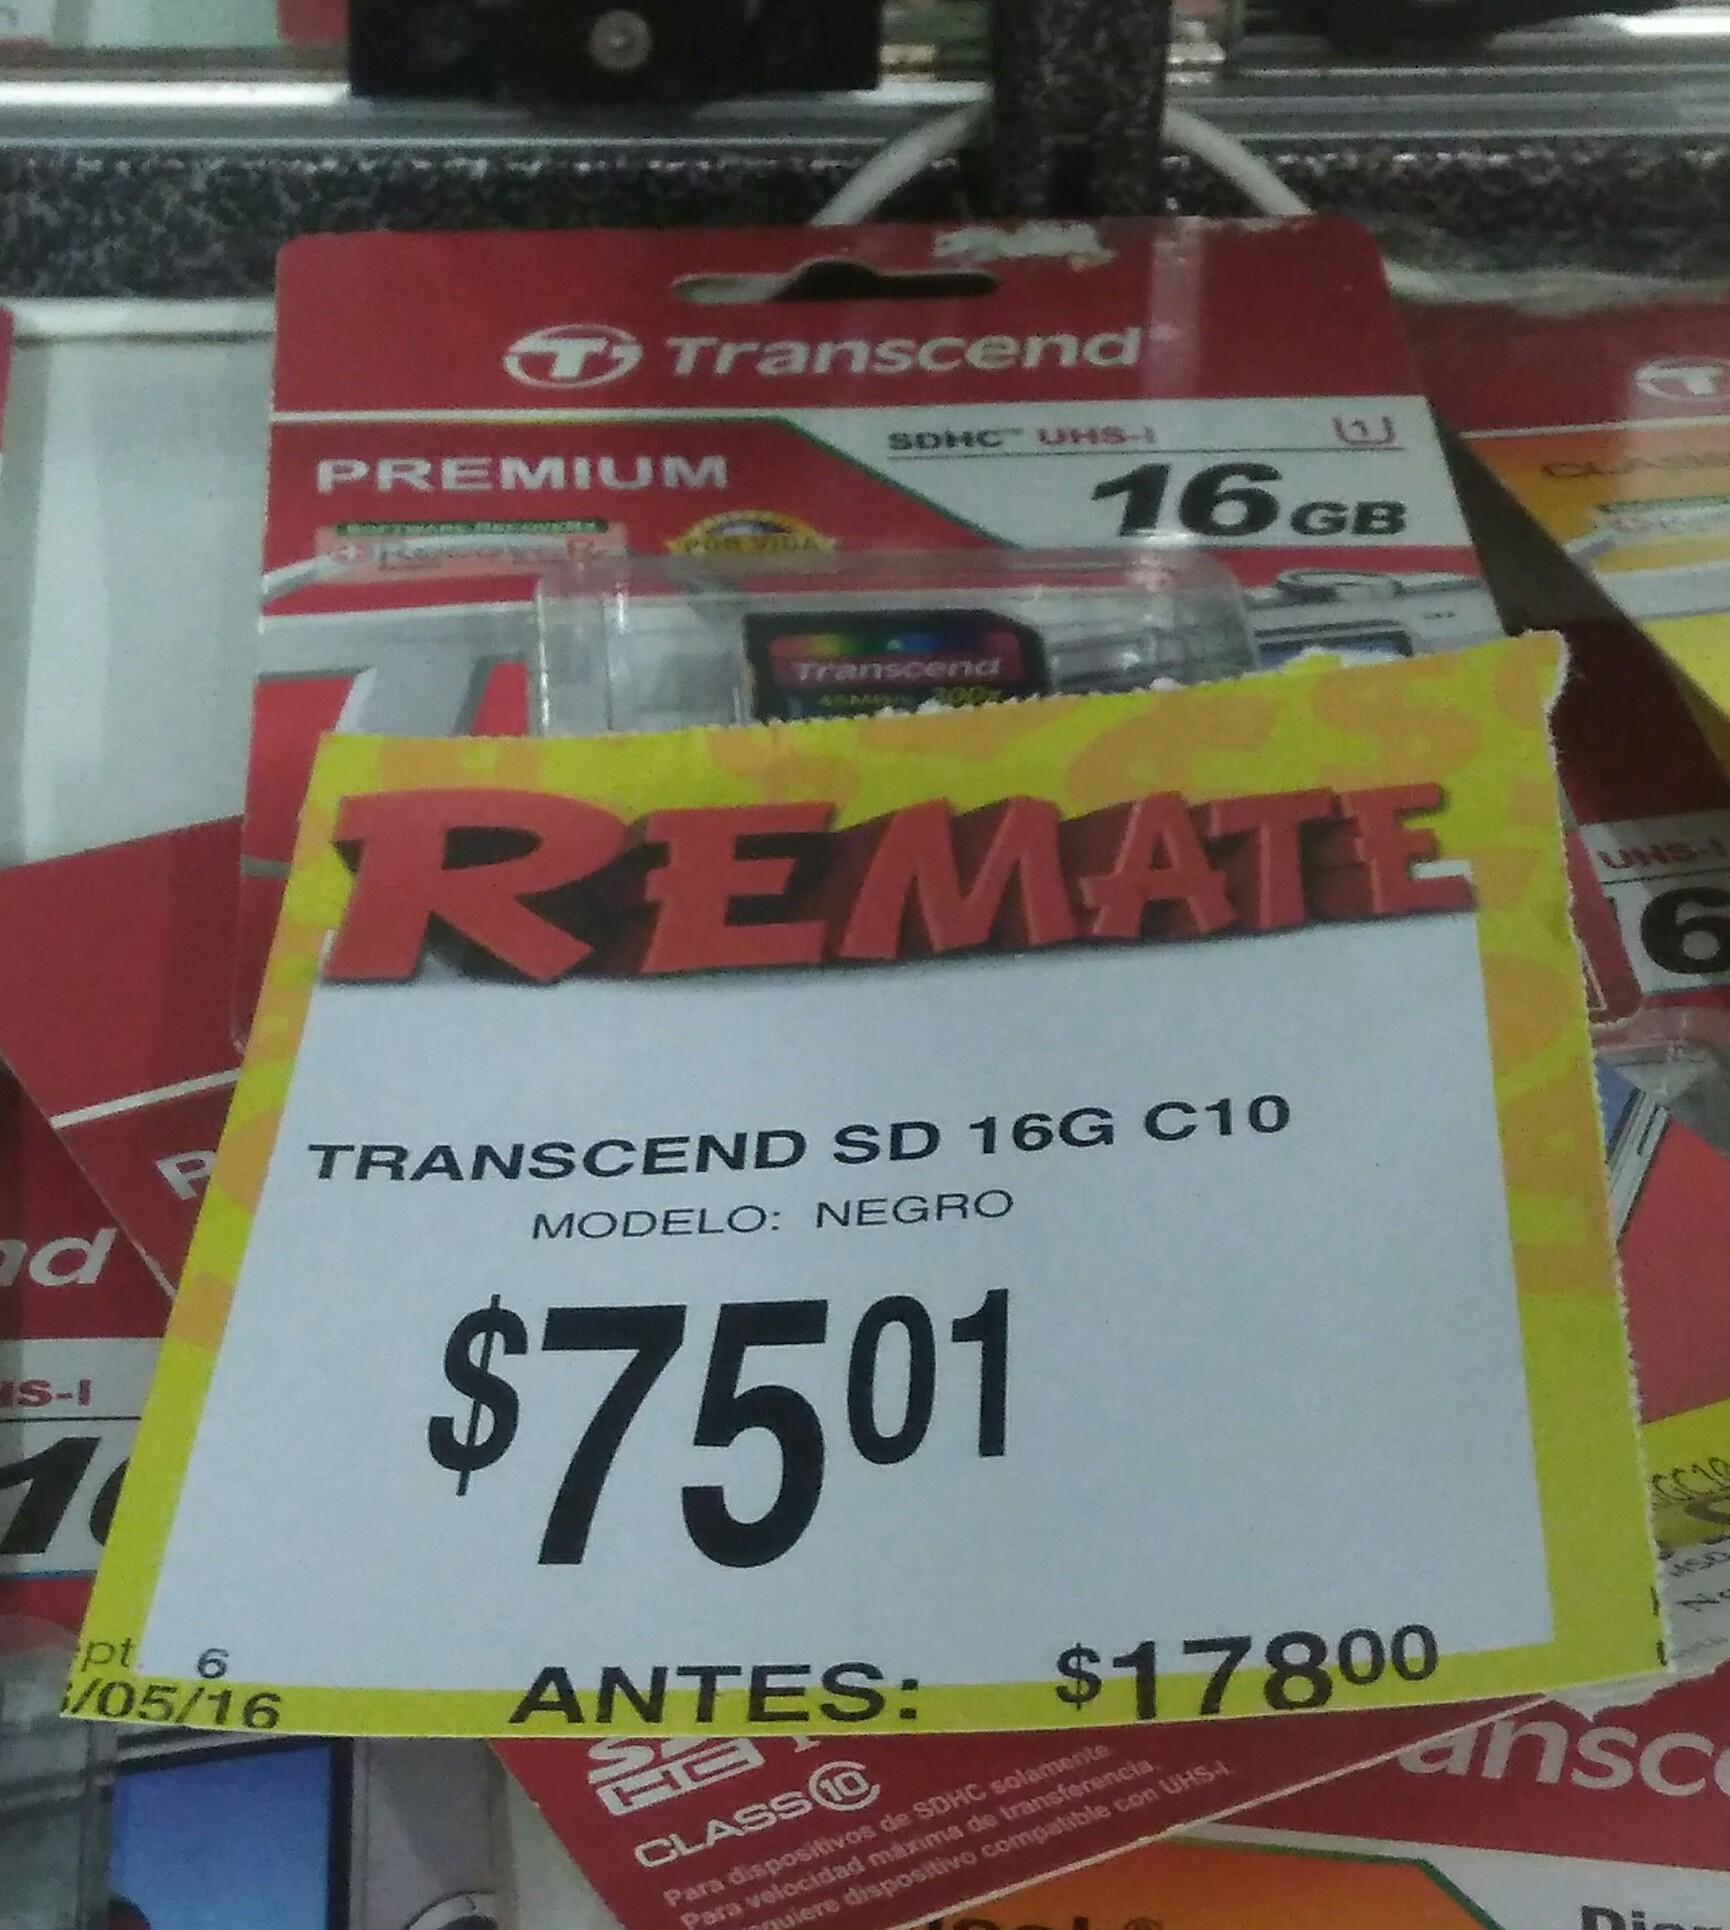 Bodega Aurrerá: Tarjeta de memoria SD, Transcend C10 de 16G a $75.01